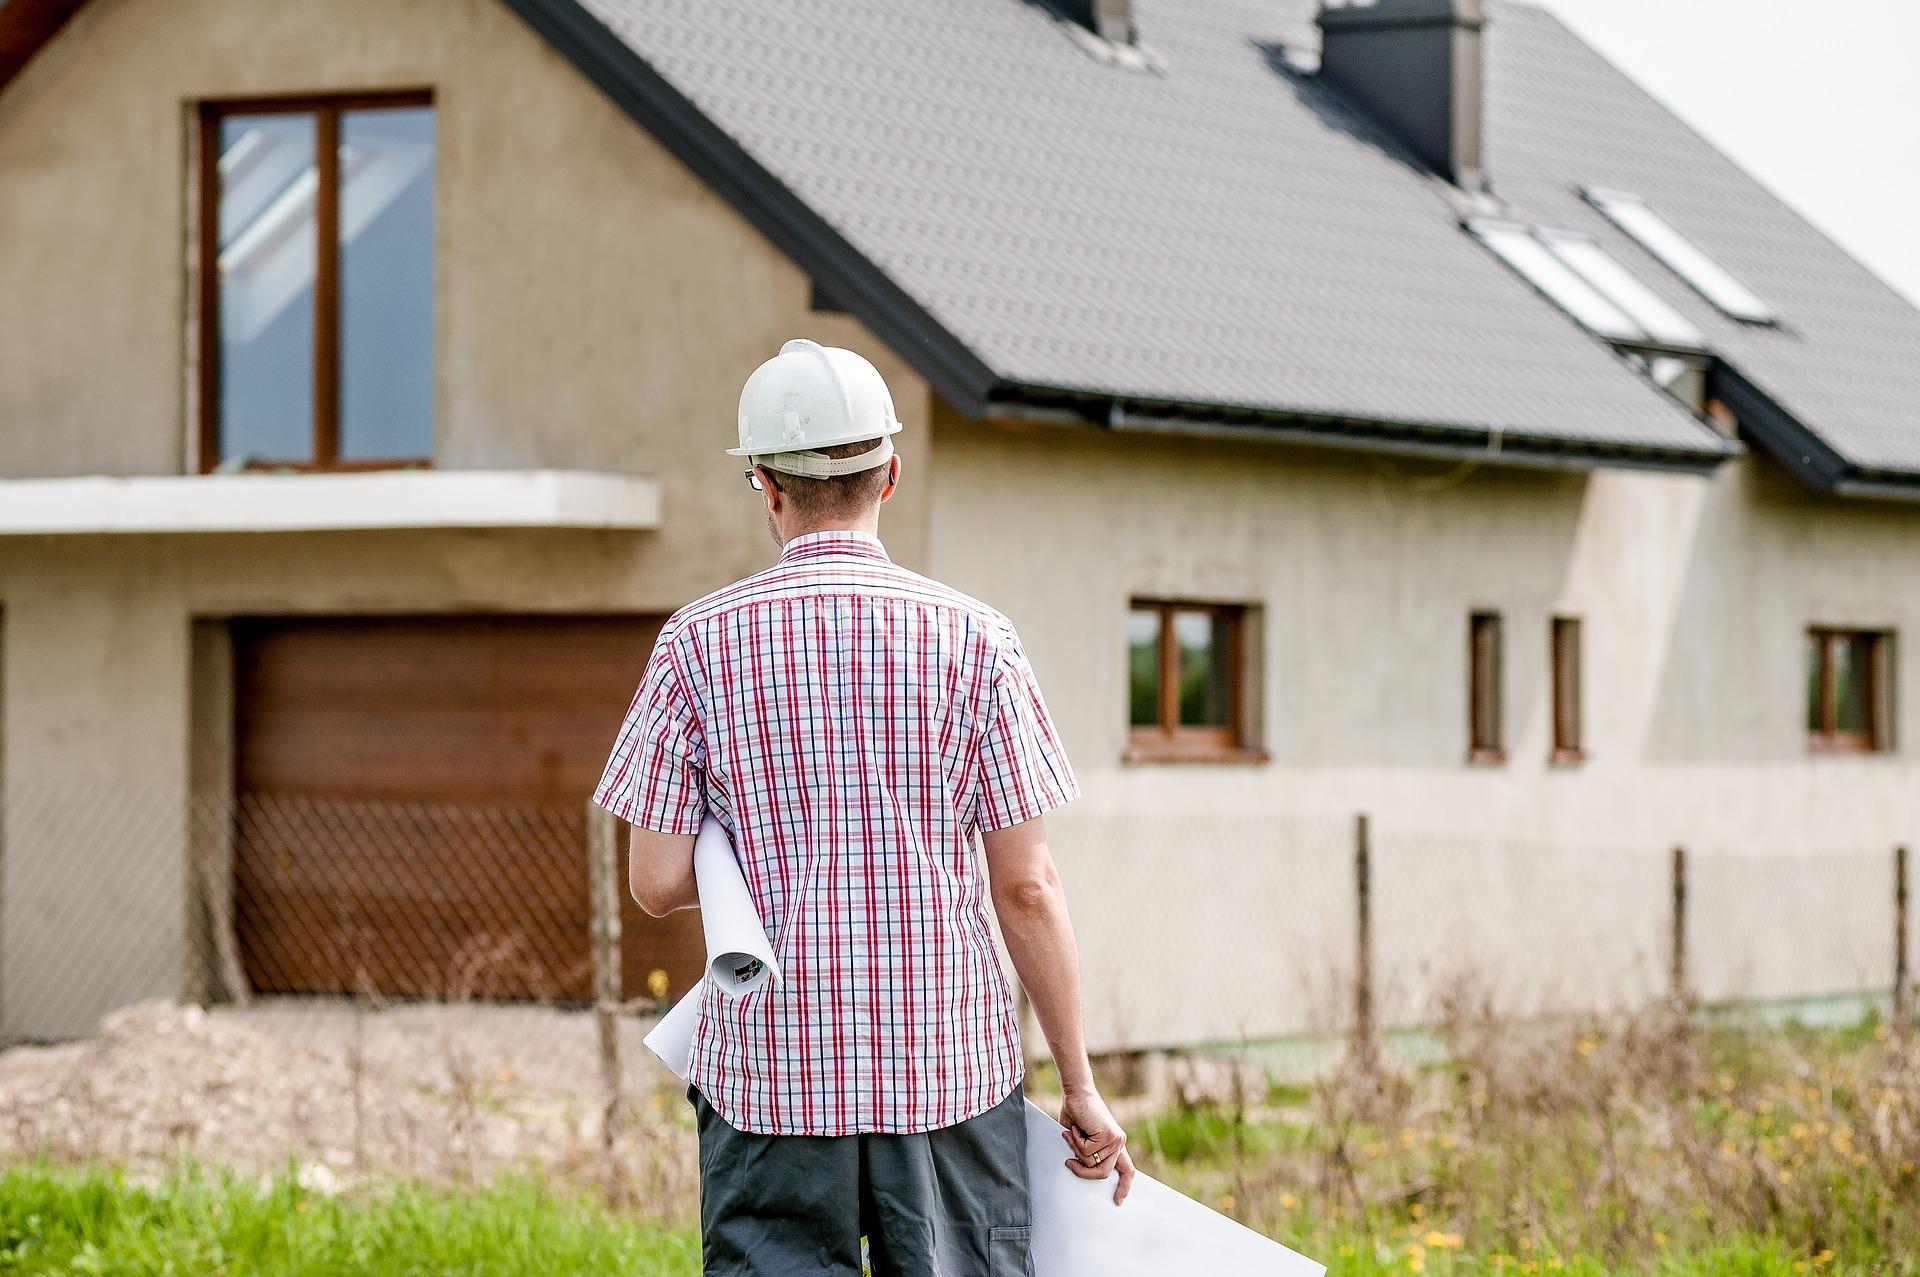 byggesagkyndig priser